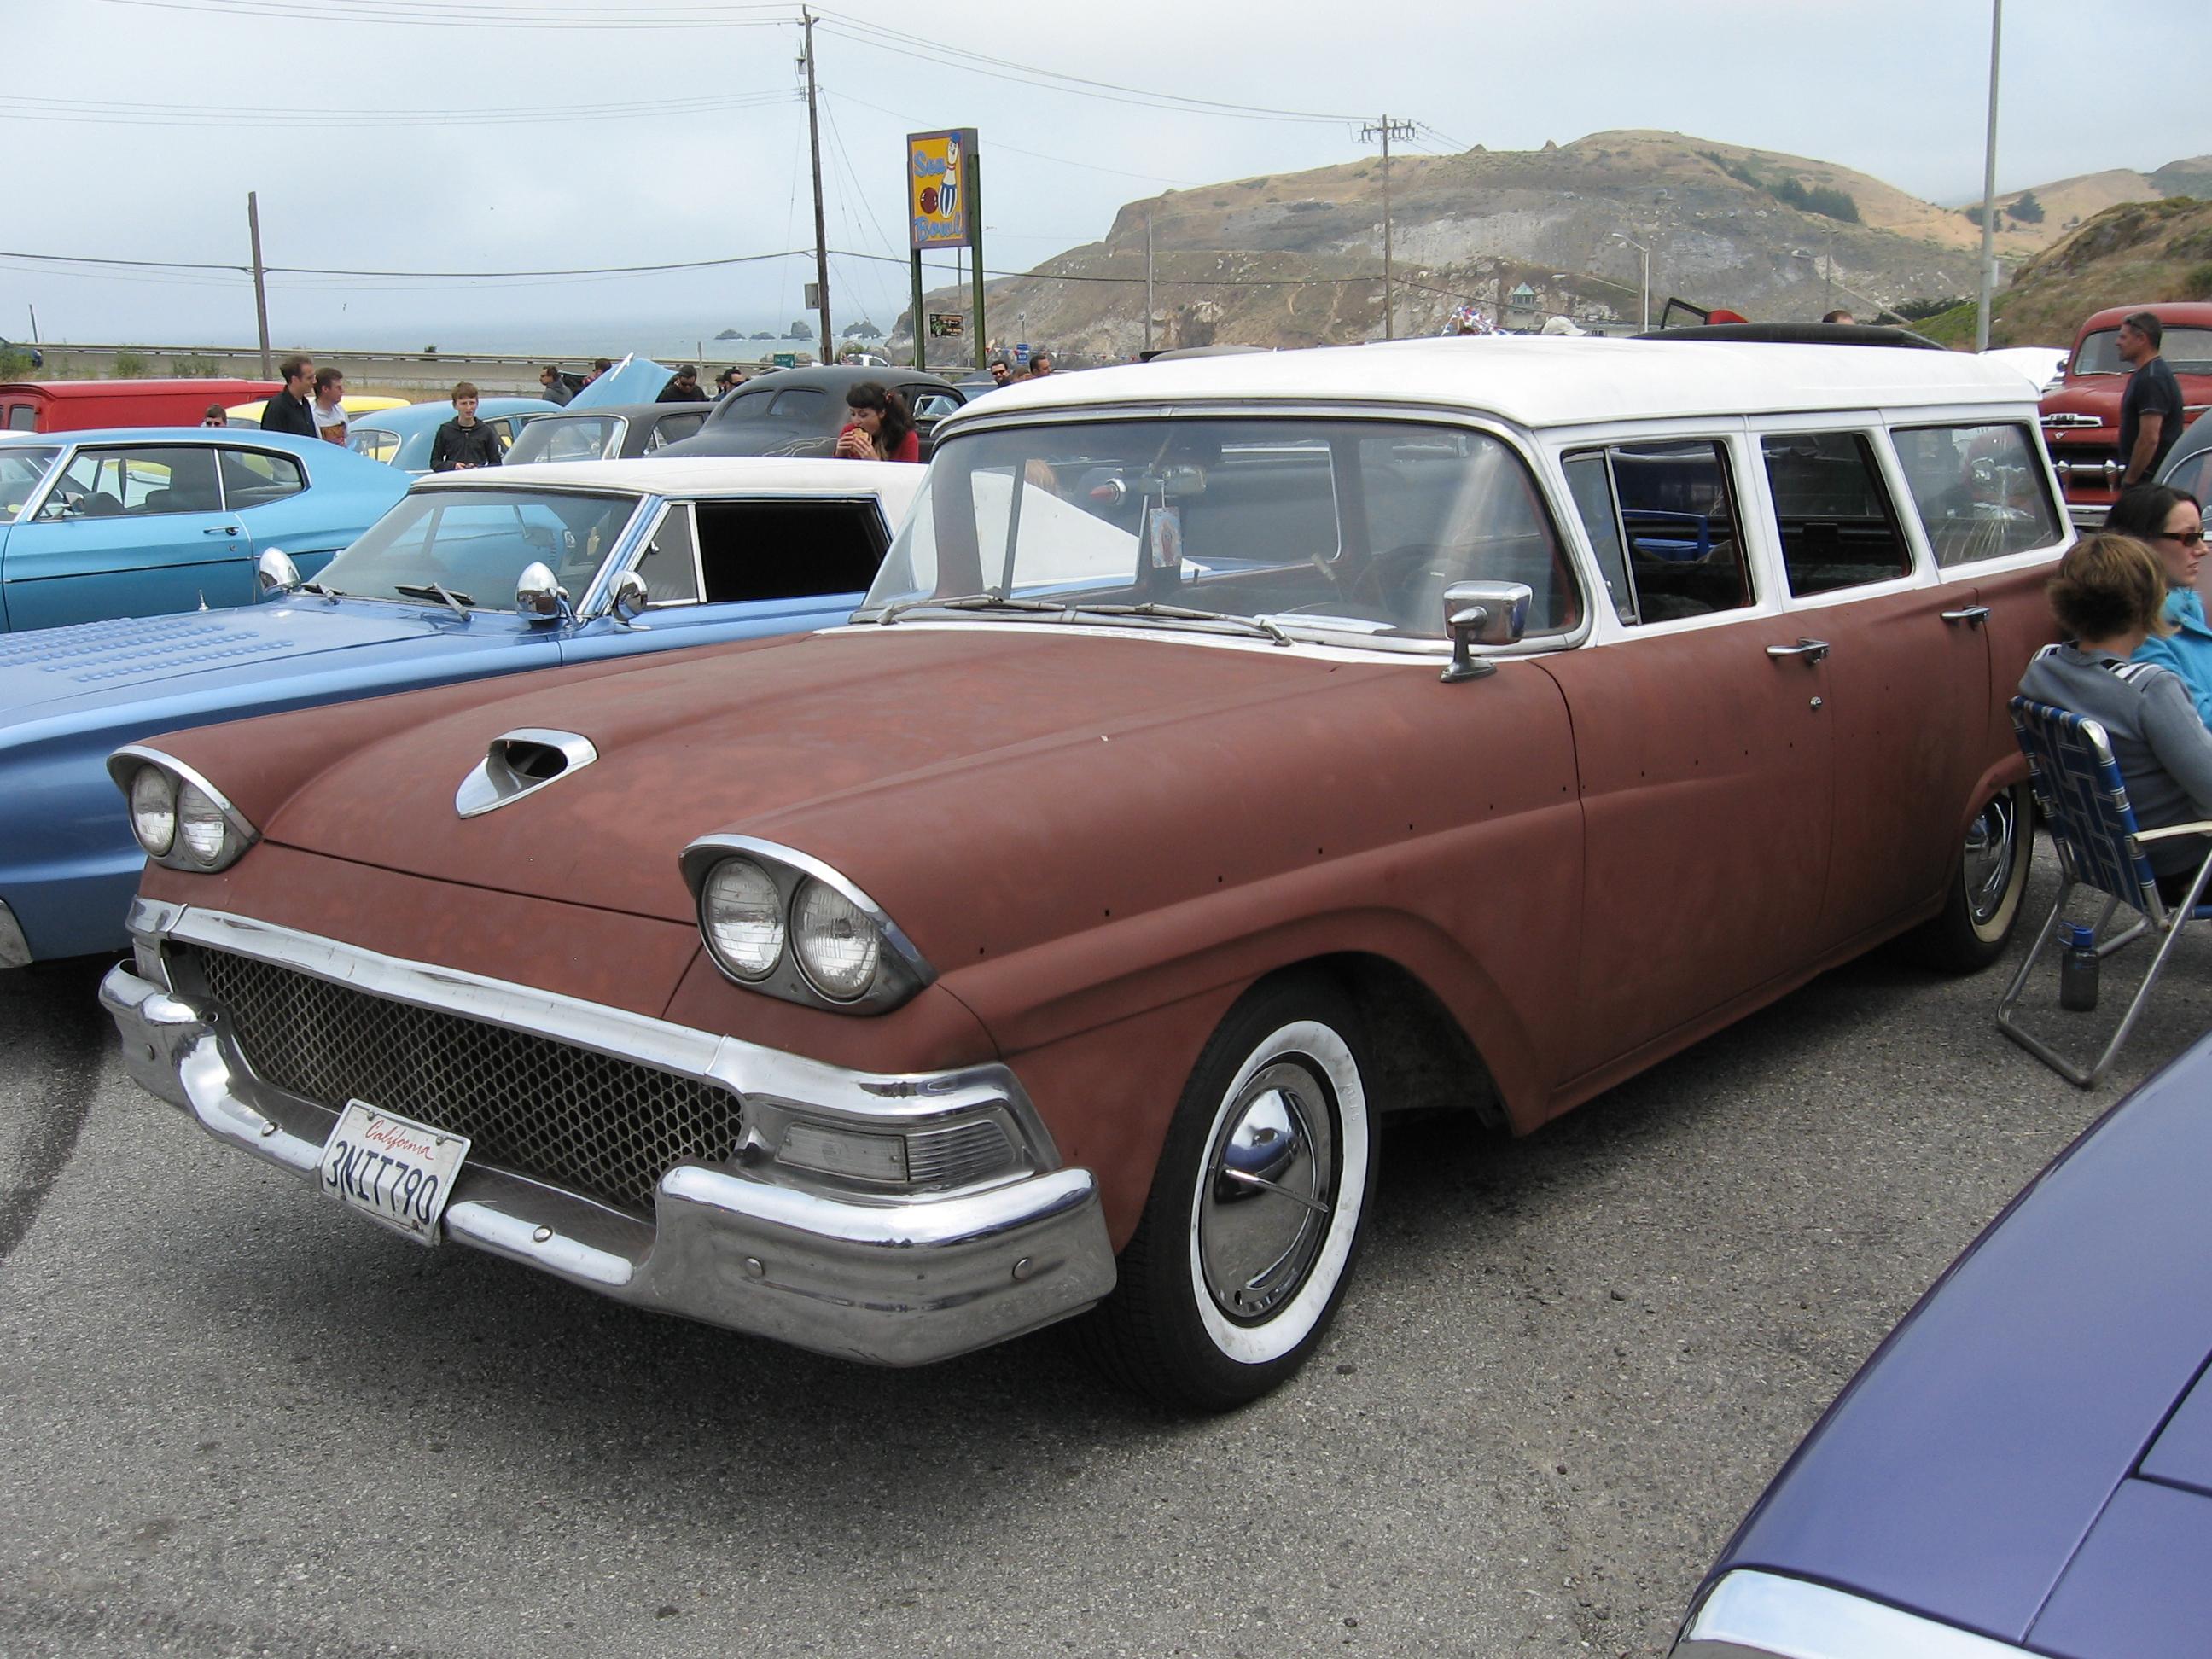 Ford Station Wagon For Sale Craigslist - a-k-b info